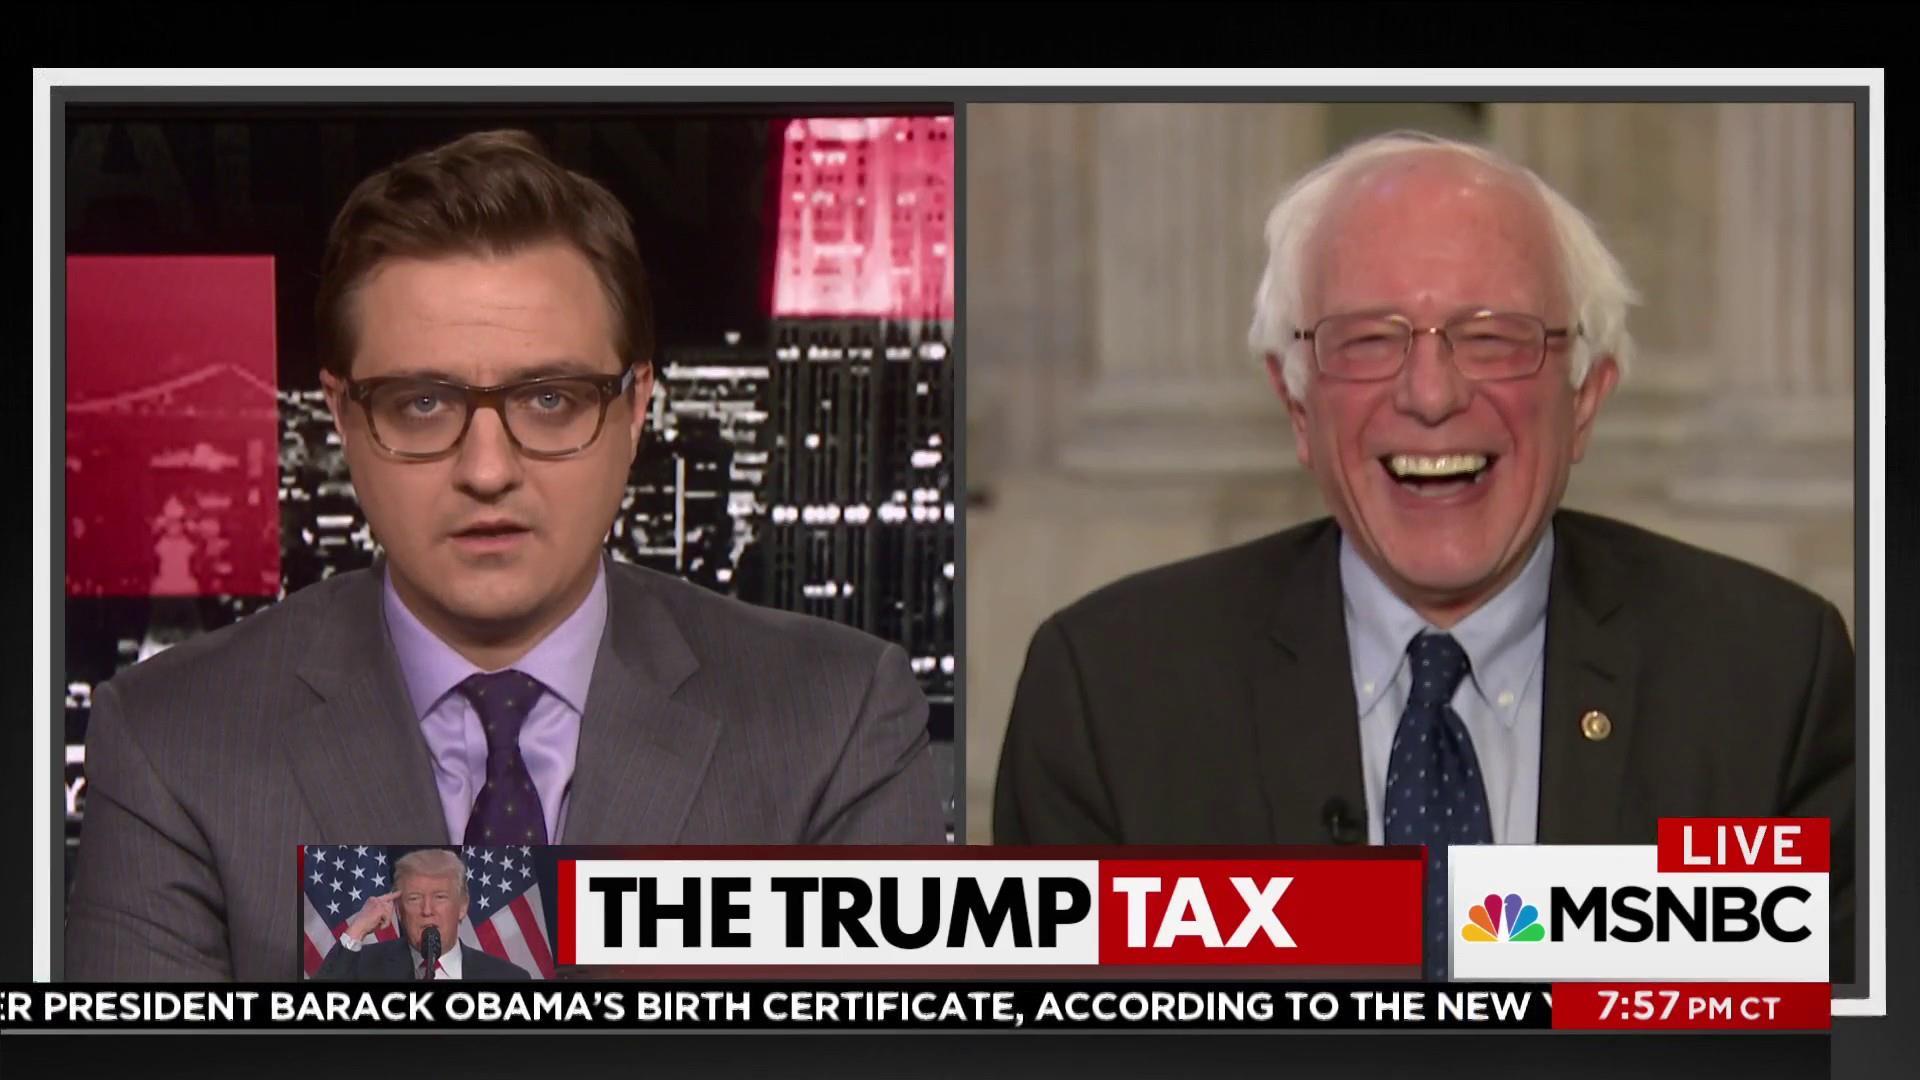 Bernie Sanders laughs at the president